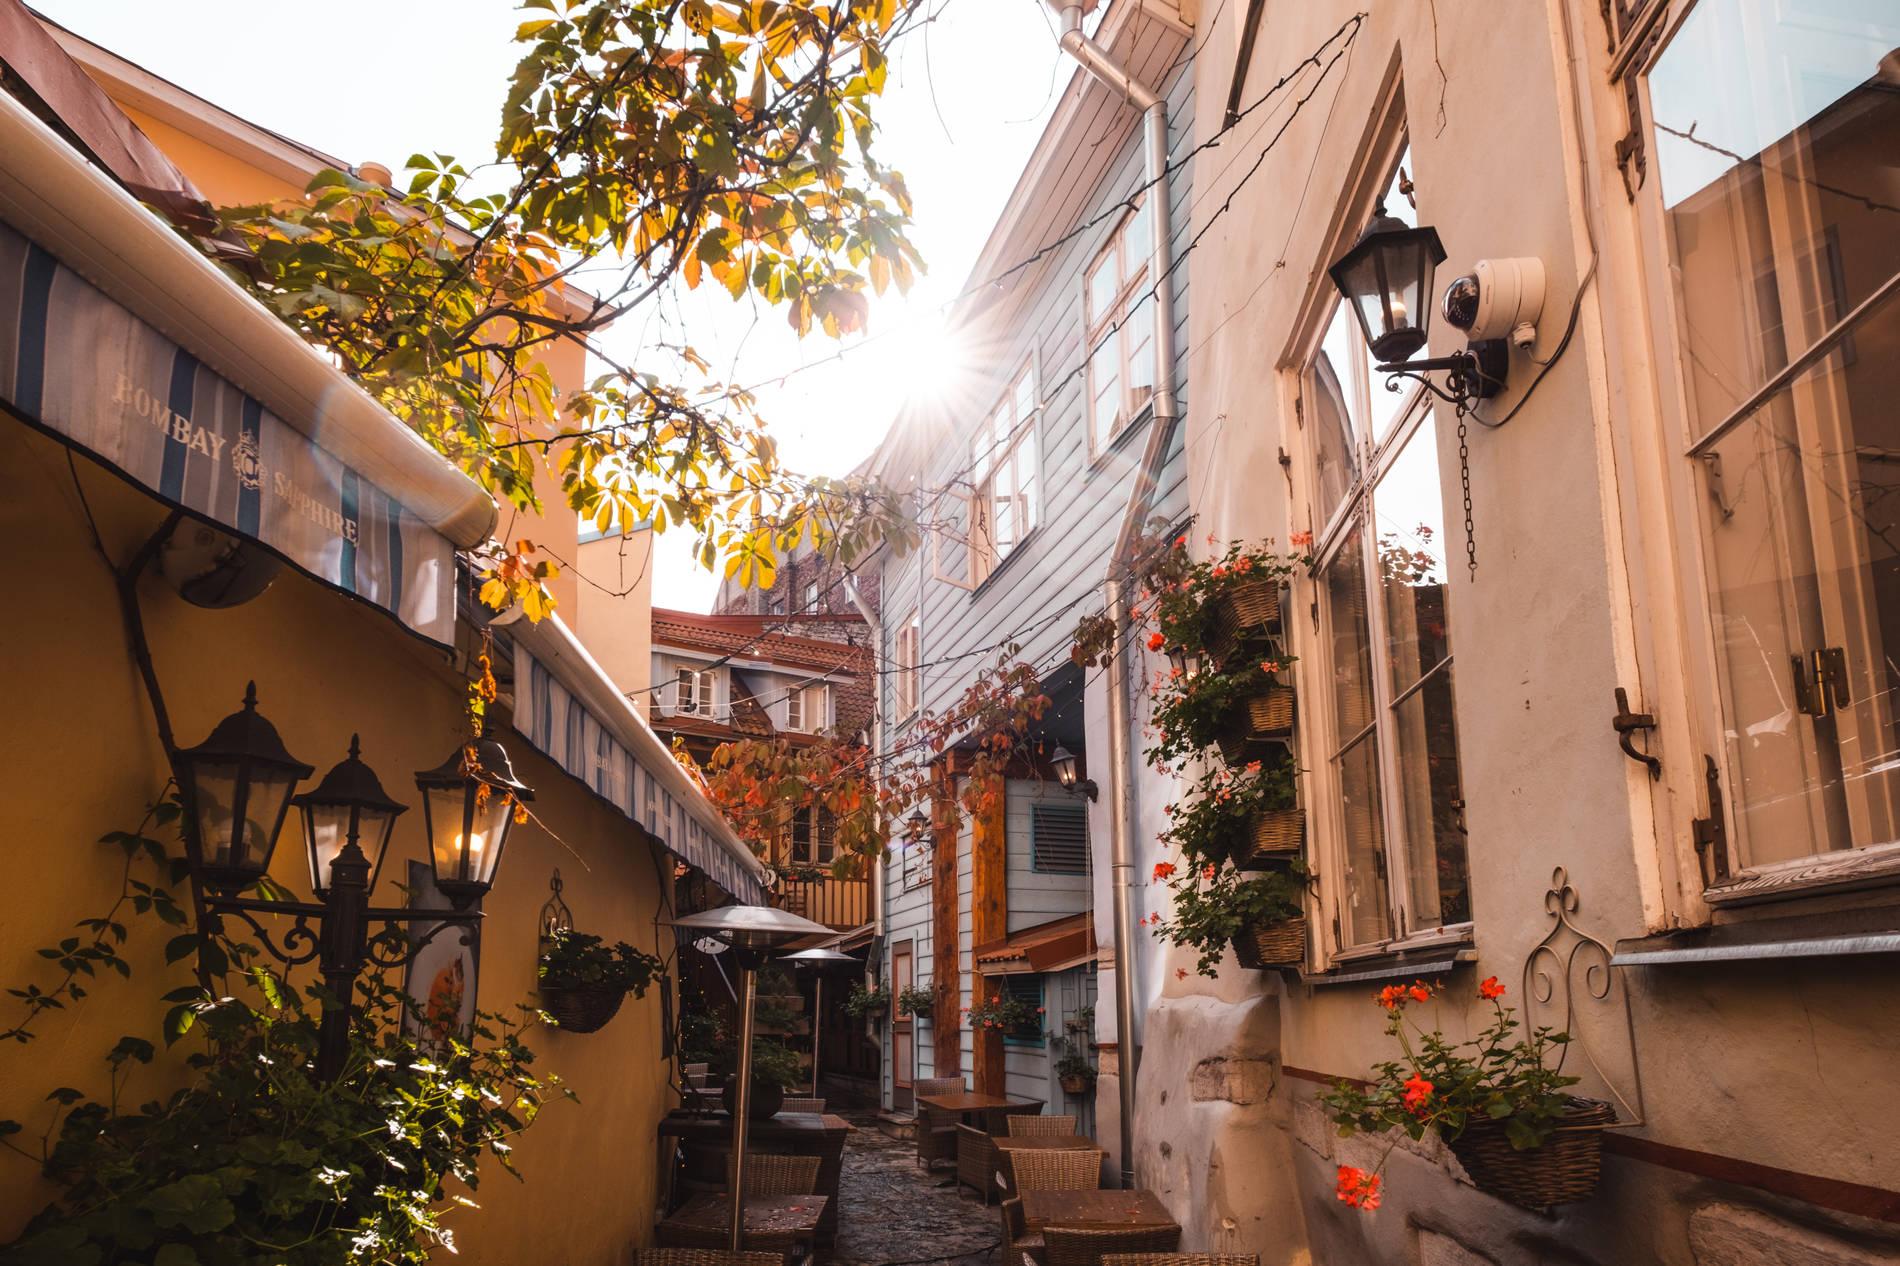 Hidden garden in Tallinn Old Town